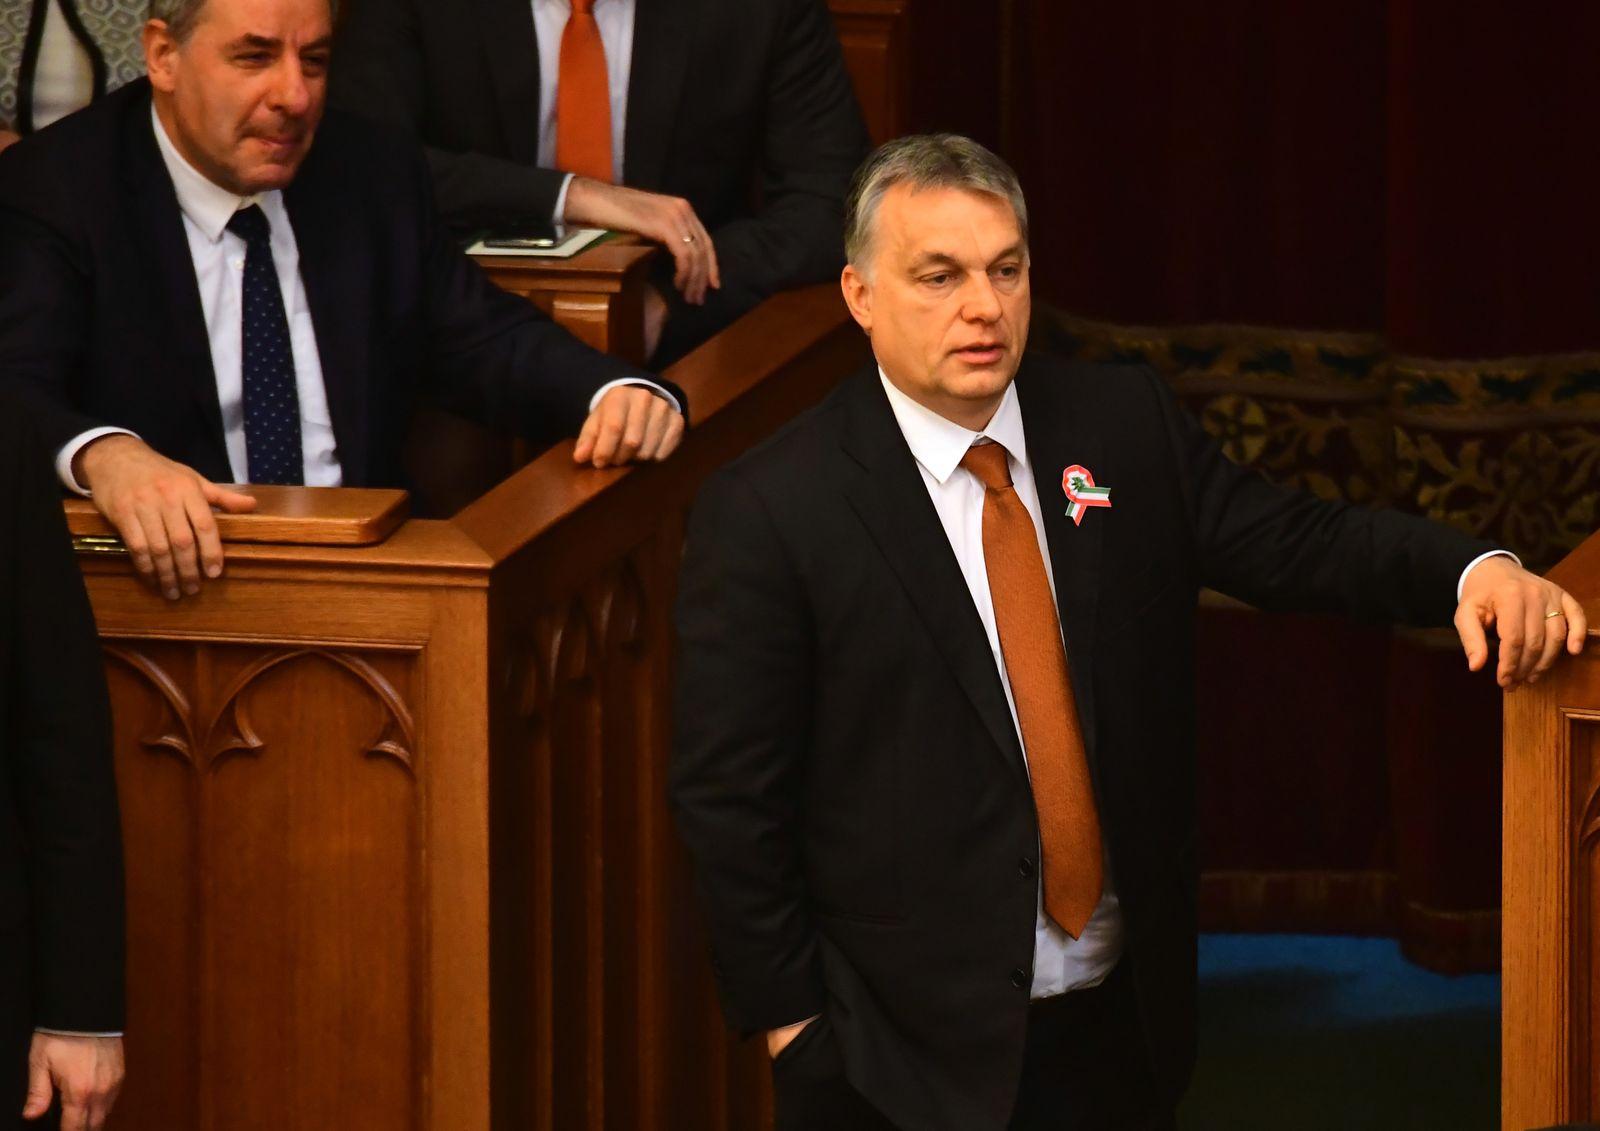 HUNGARY-POLITICS-PARLIAMENT-PRESIDENTIAL-ELECTION